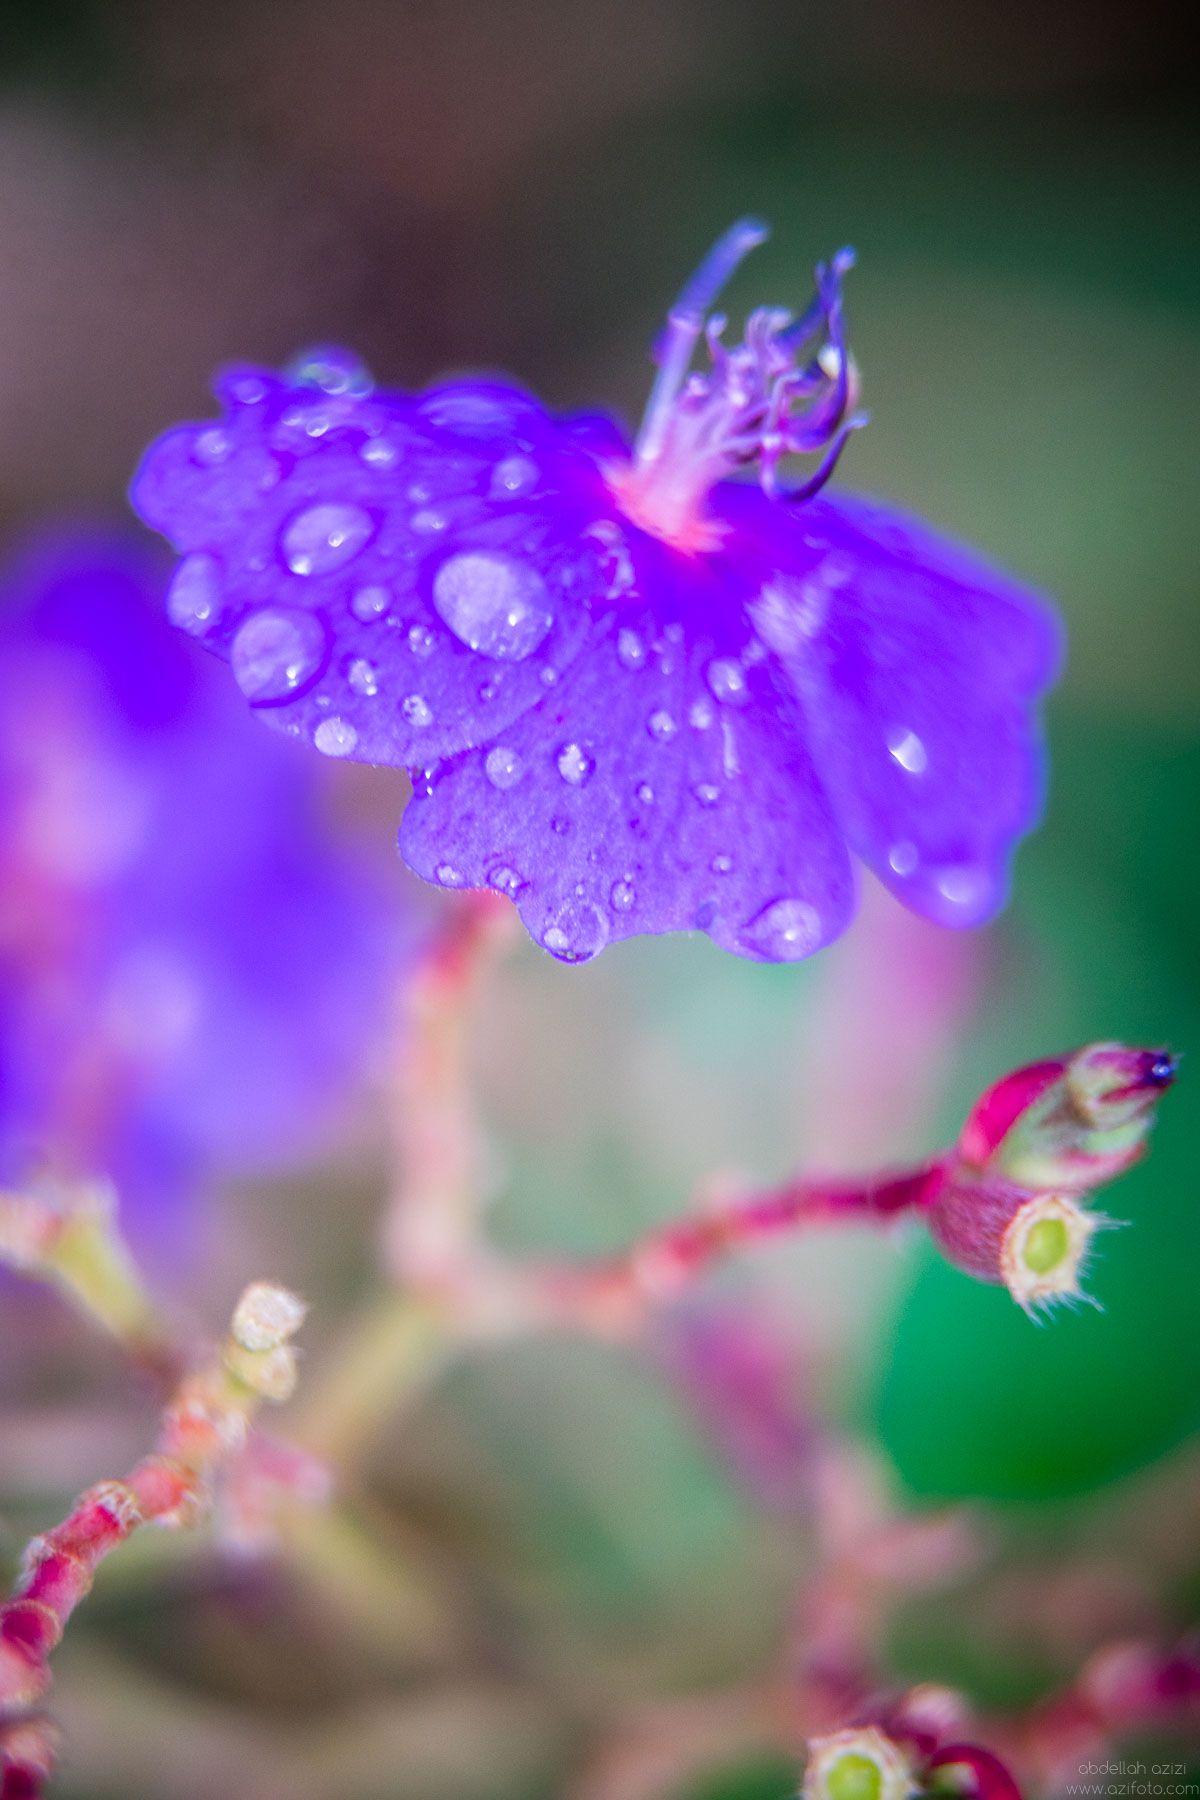 Purpler flower clos up